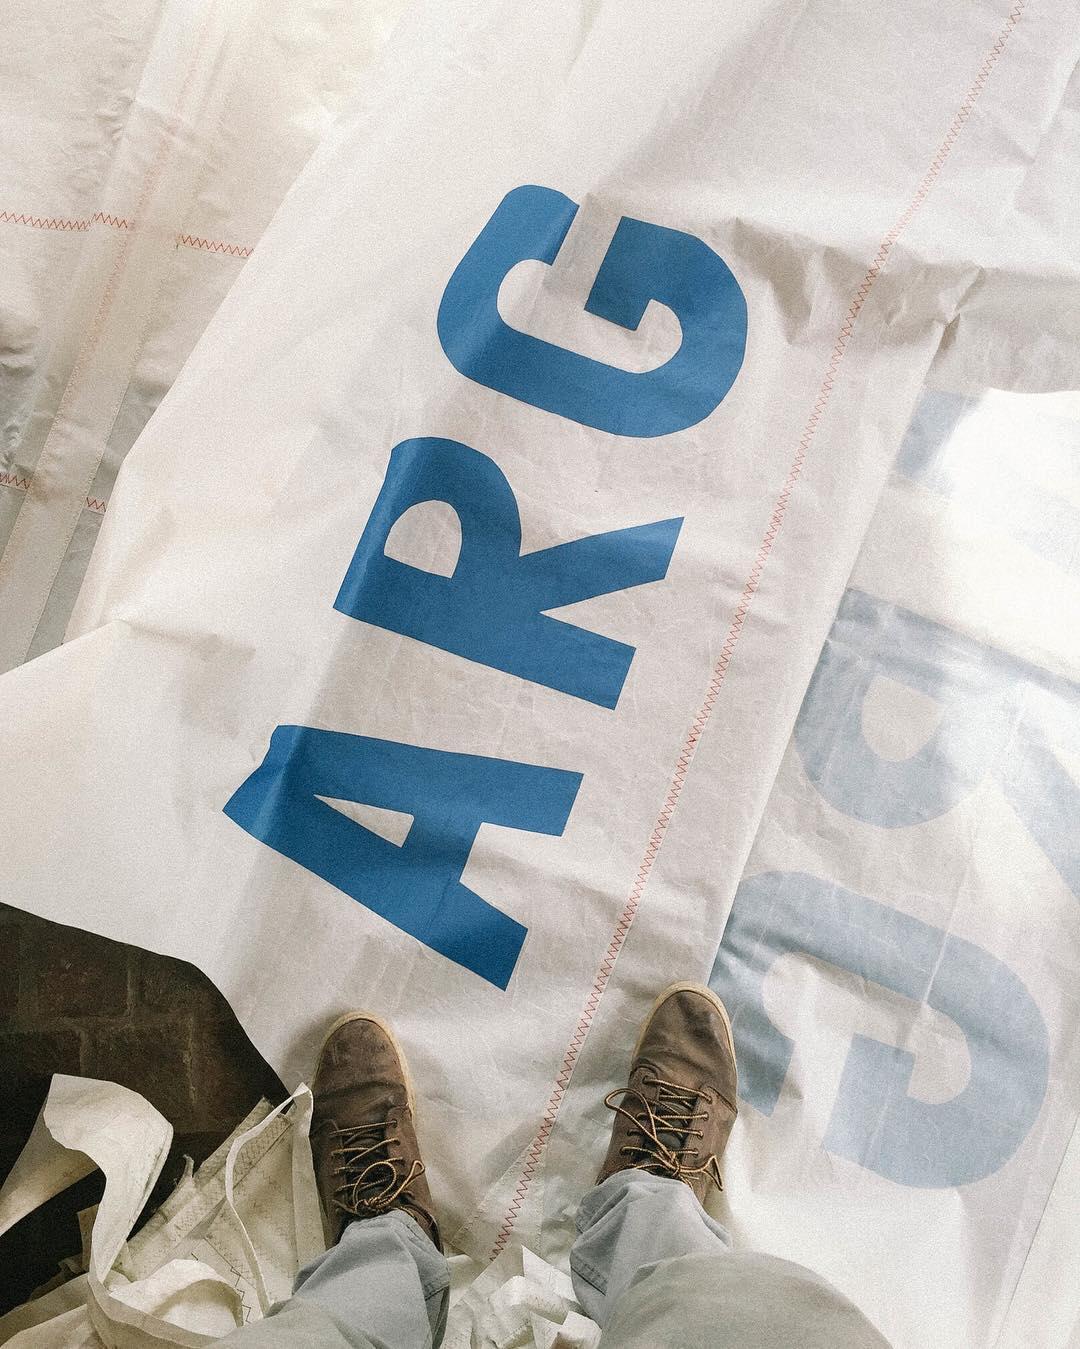 Hoy mas que nunca #vamosargentina  www.tinchoandlola.com ------ #sailorscollection #tincholife #argentina #velasdebarco #recicladas #recycled #upcycled #sails #sailing #yachting